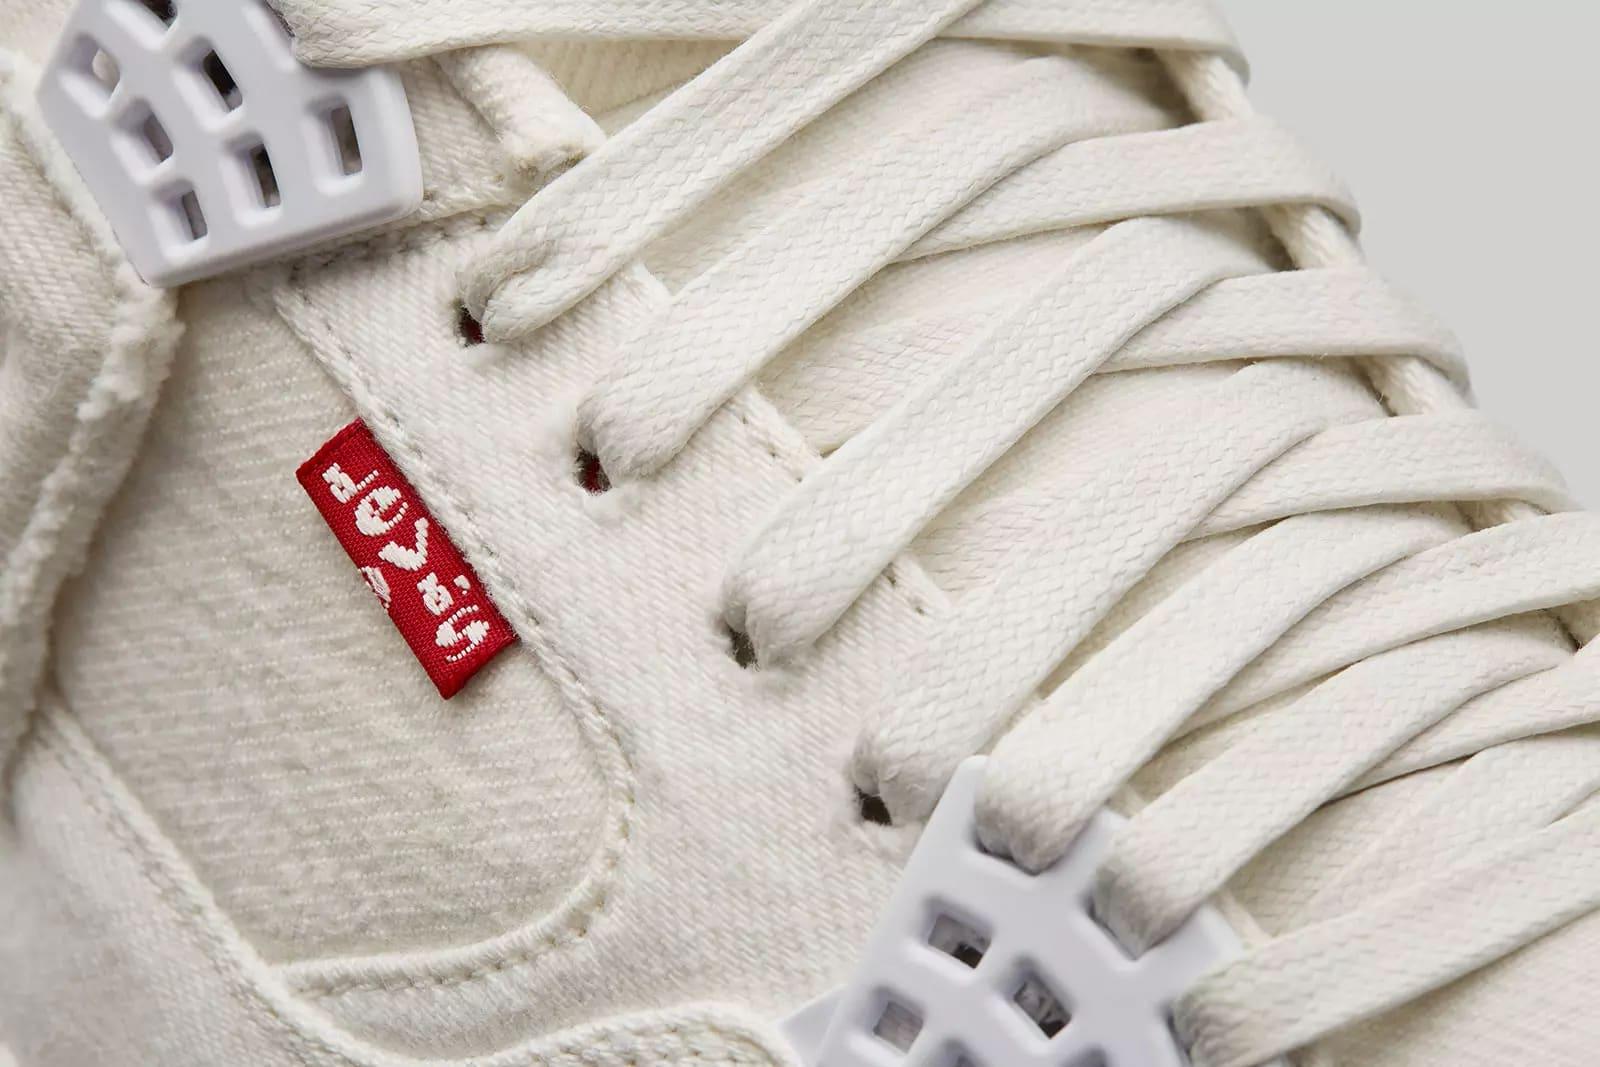 Levi's x Air Jordan 4 'White' AO2571-100 (Detail)